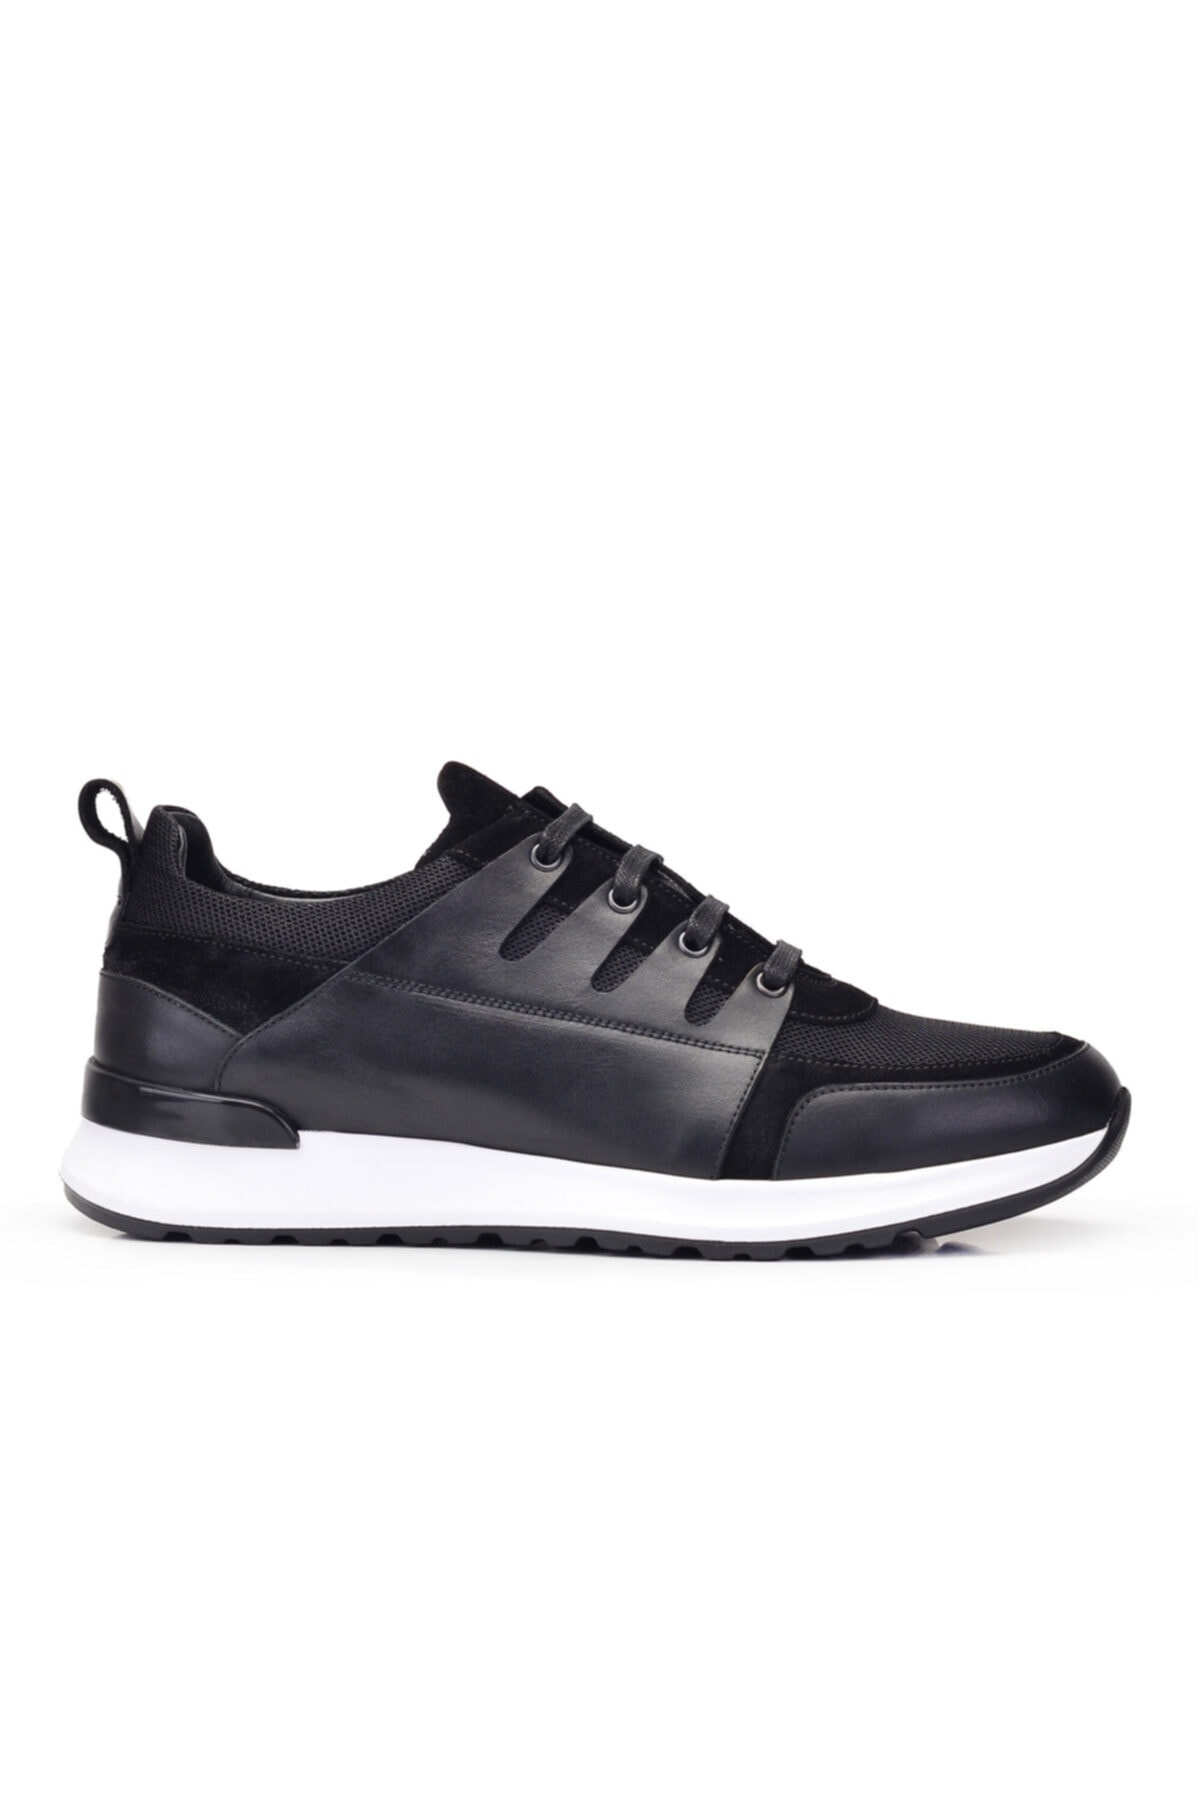 Nevzat Onay Hakiki Deri Siyah Sneaker Erkek Ayakkabı -11783- 1